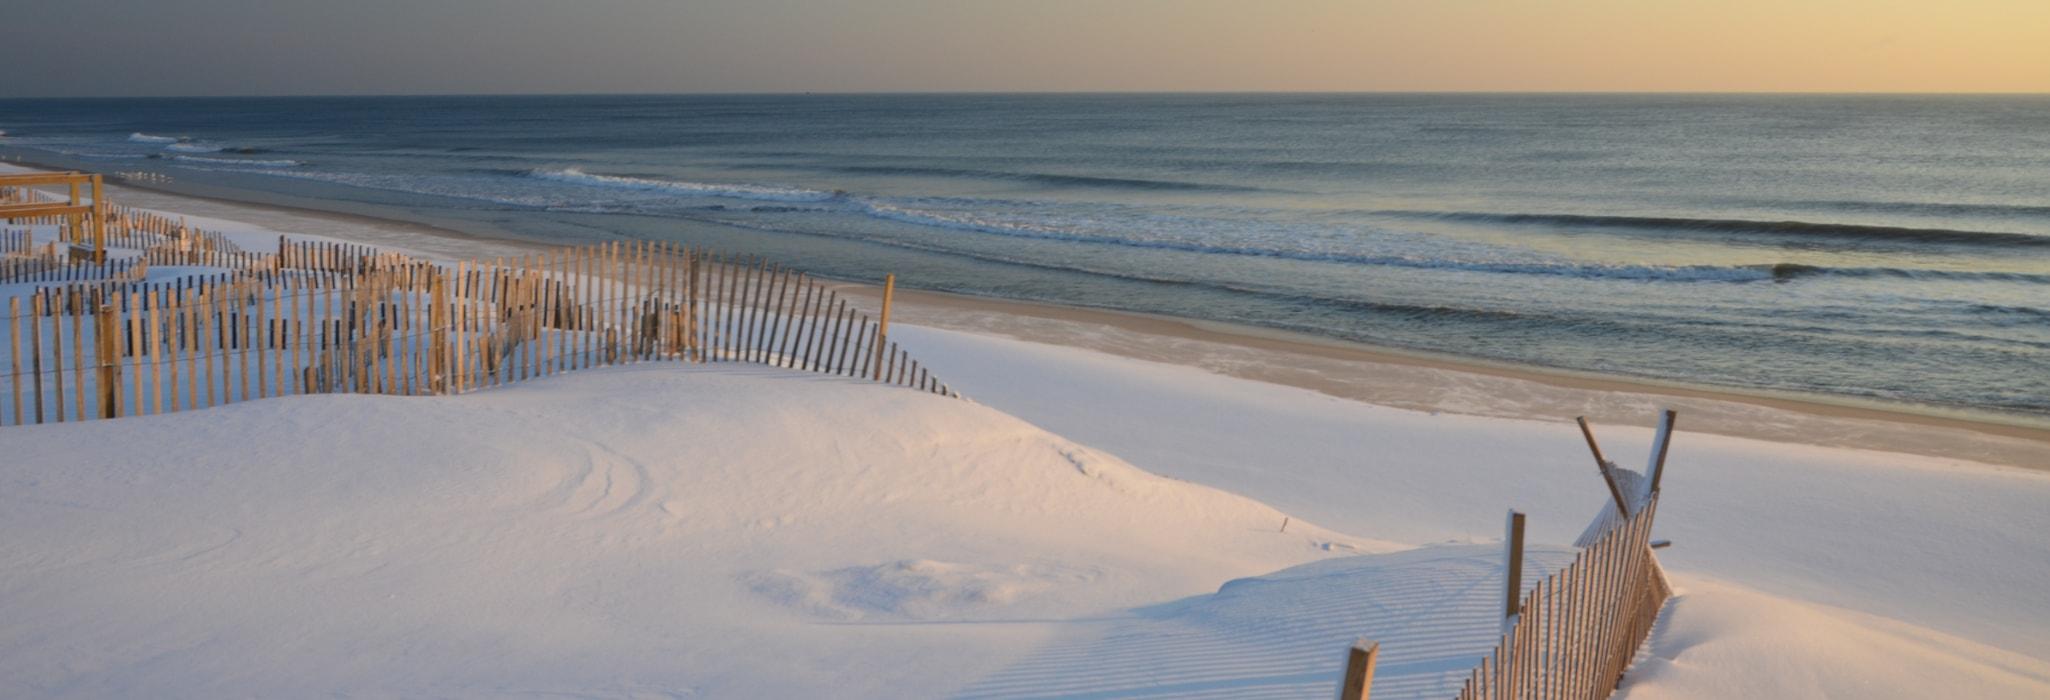 Winter on the beach.